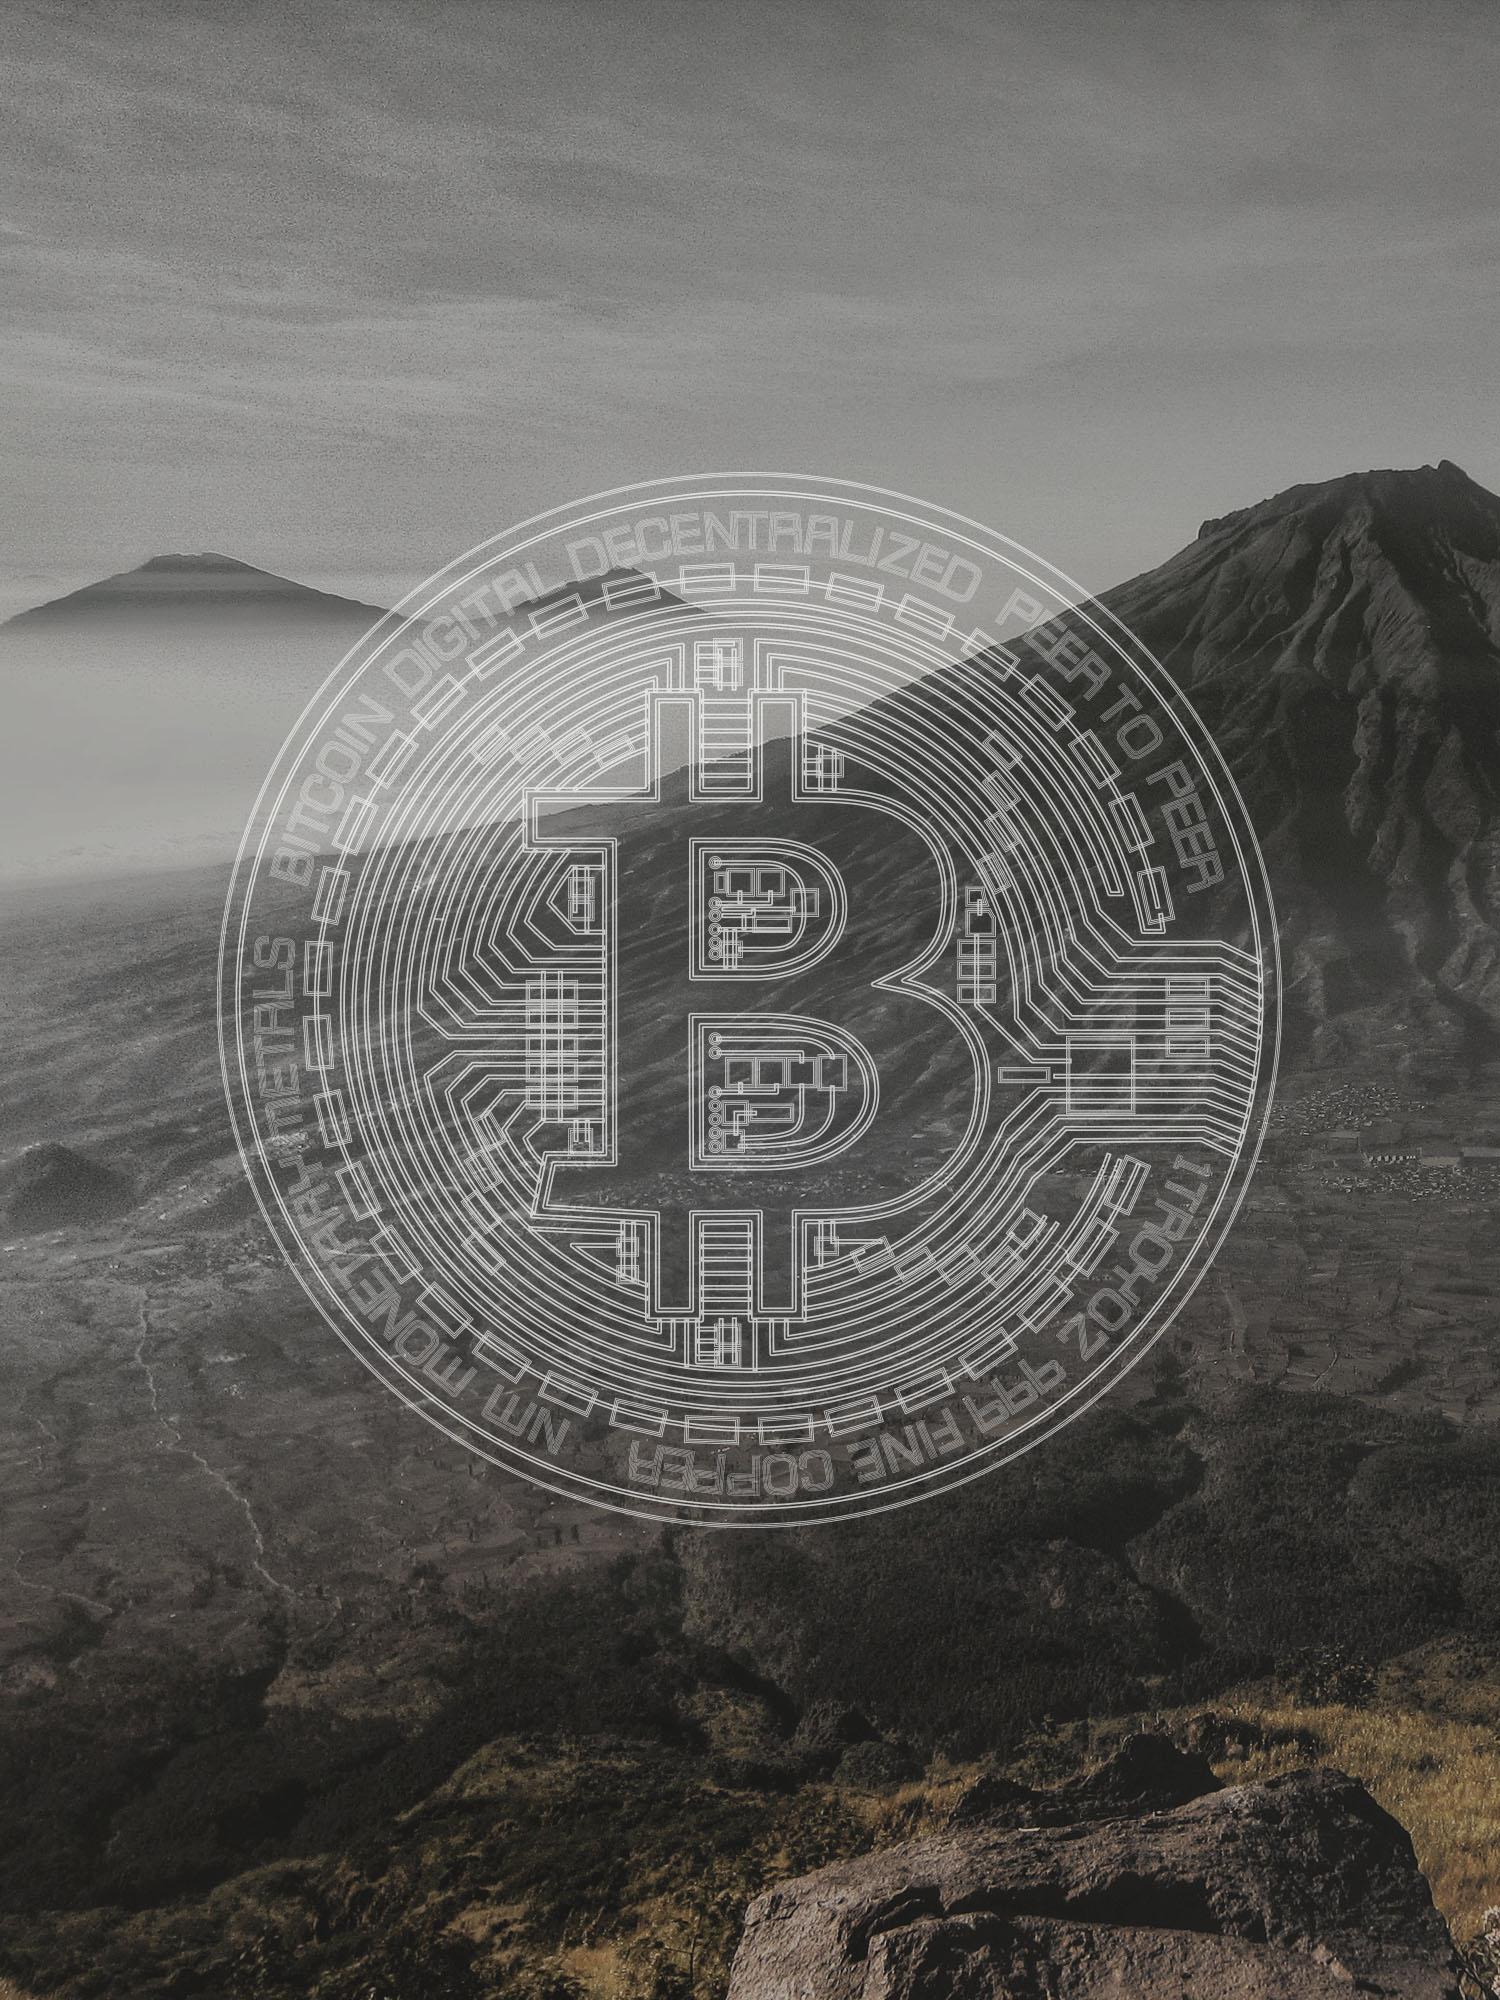 Bitcoin Maximalist or Minimalists